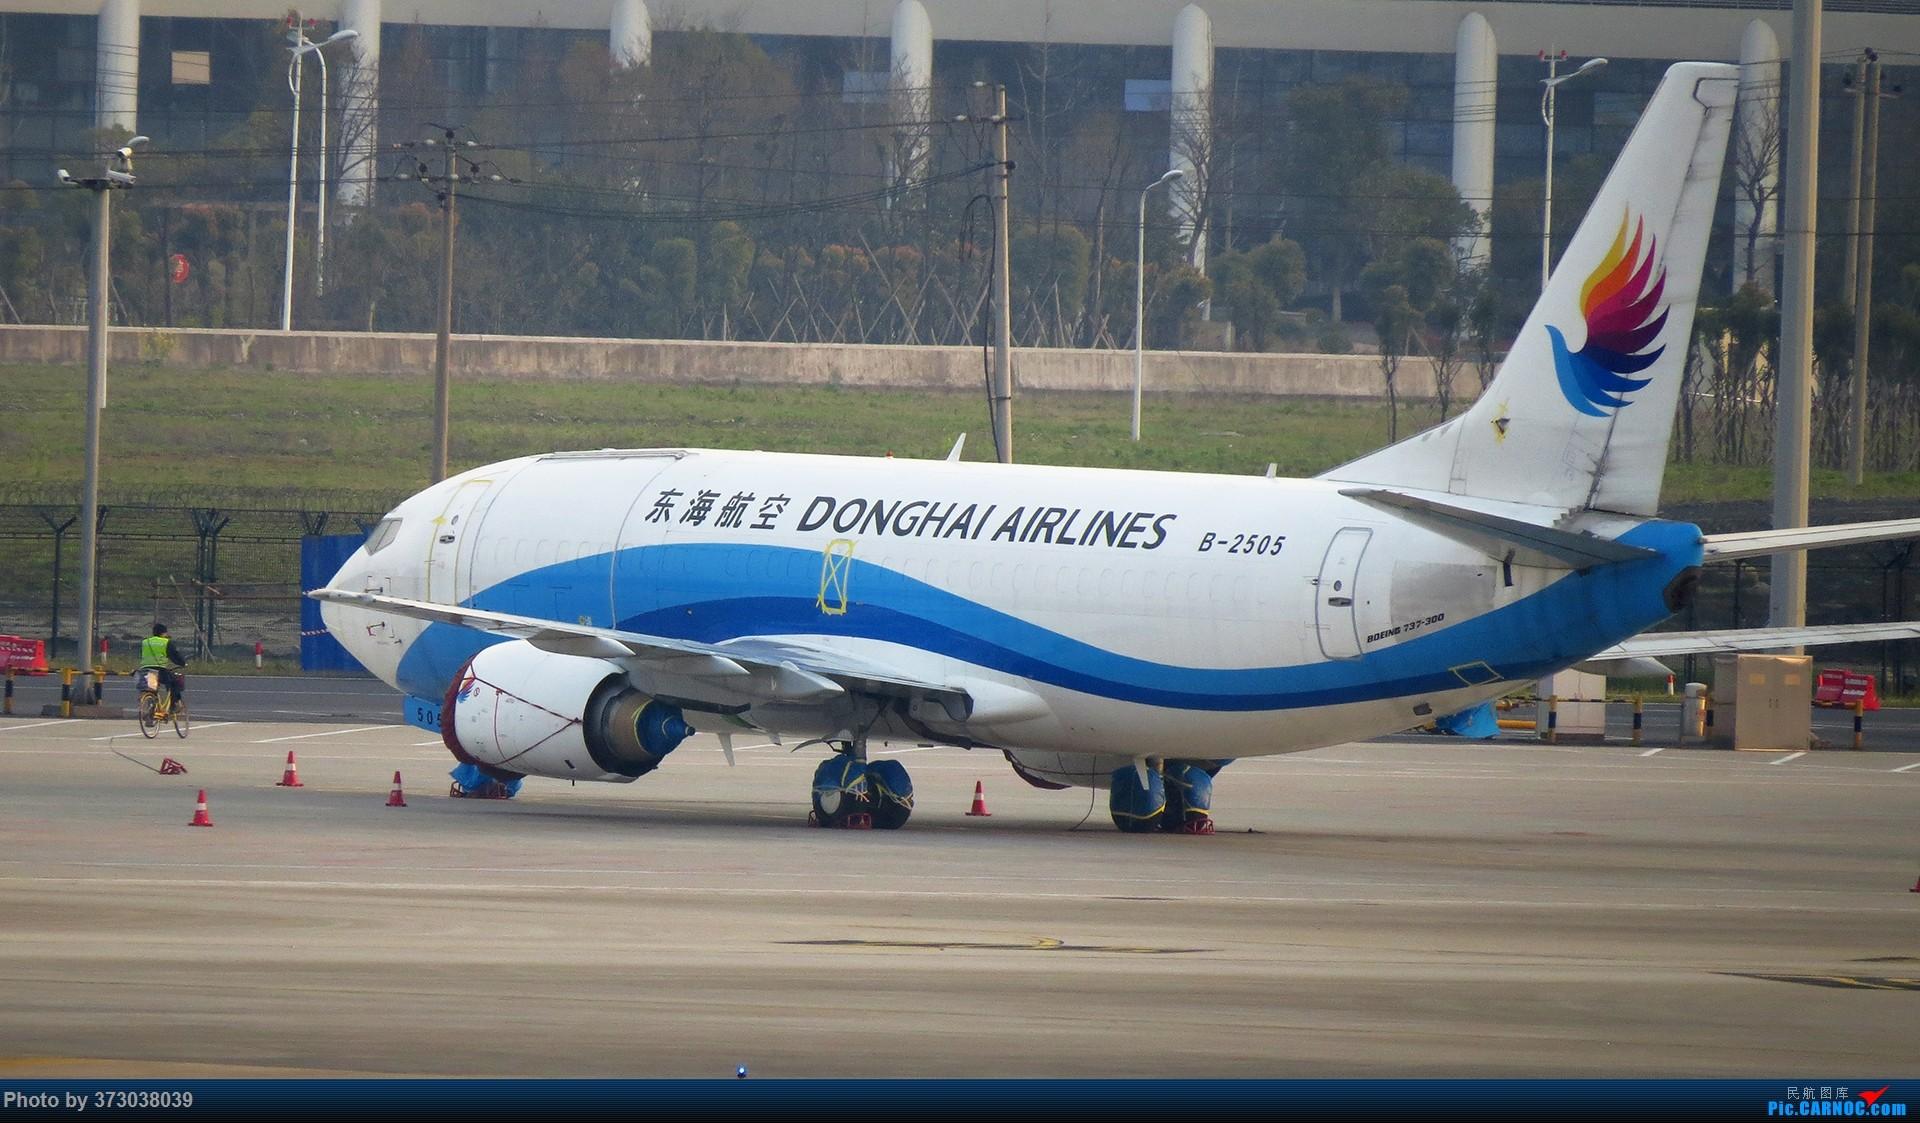 Re:[原创]【杭州飞友会 】50周年,烂大街的波音737 杭州飞友接力照 BOEING 737-300 B-2505 中国杭州萧山国际机场